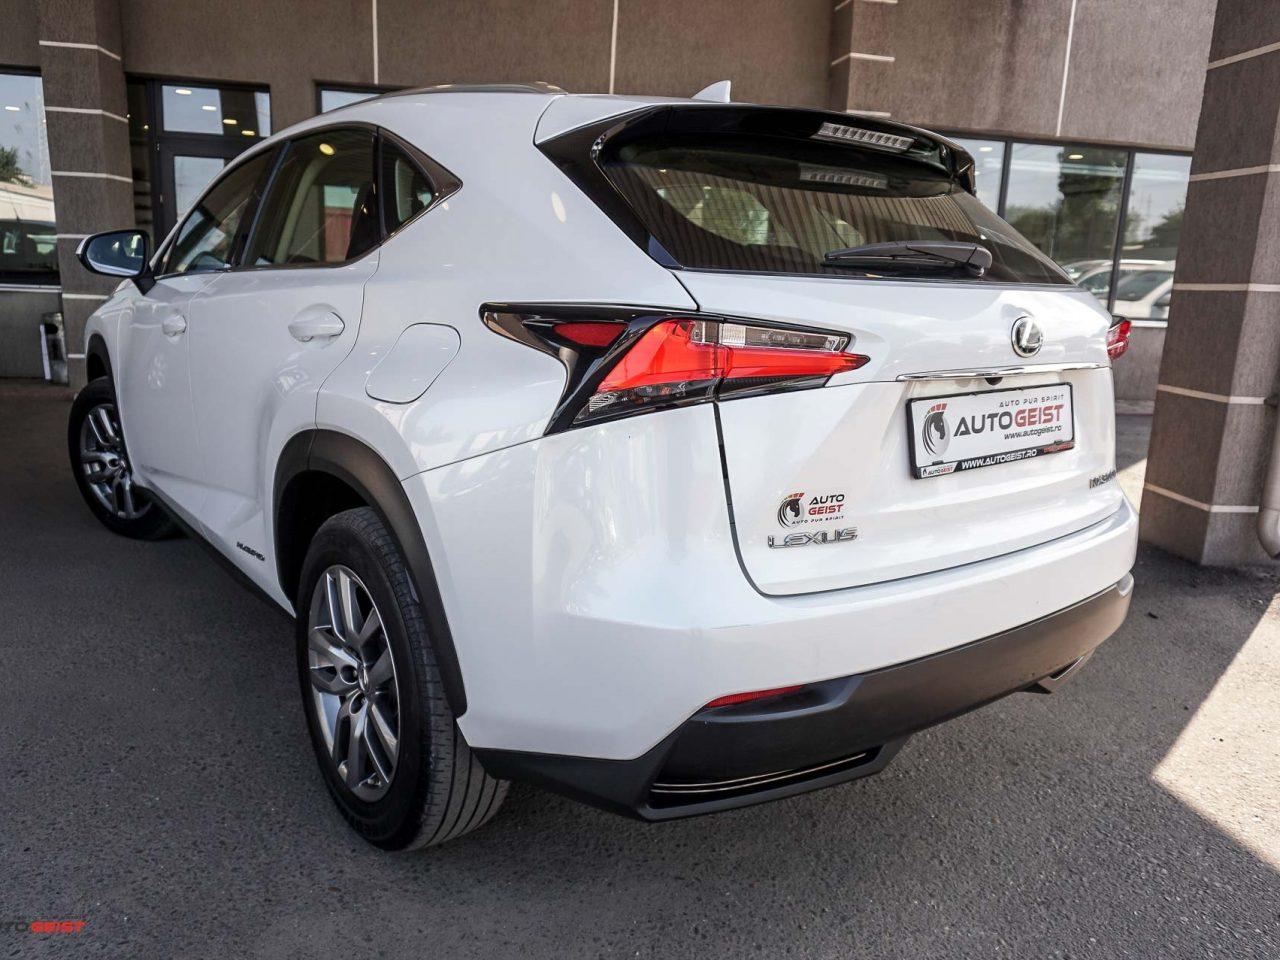 lexus-nx300h-hybrid-1023-02440